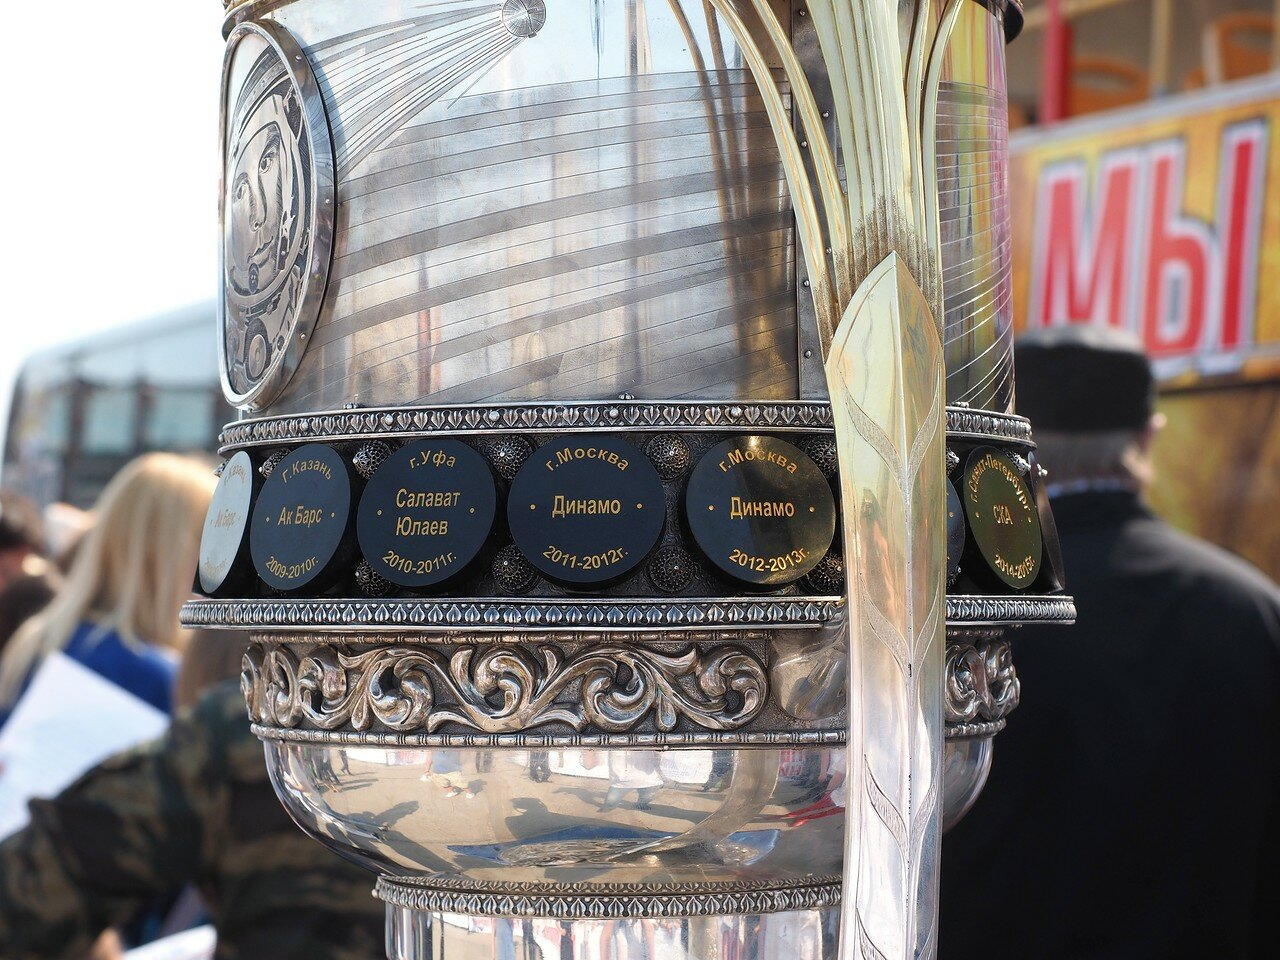 193Церемония чествования команды Металлург27.05.2016